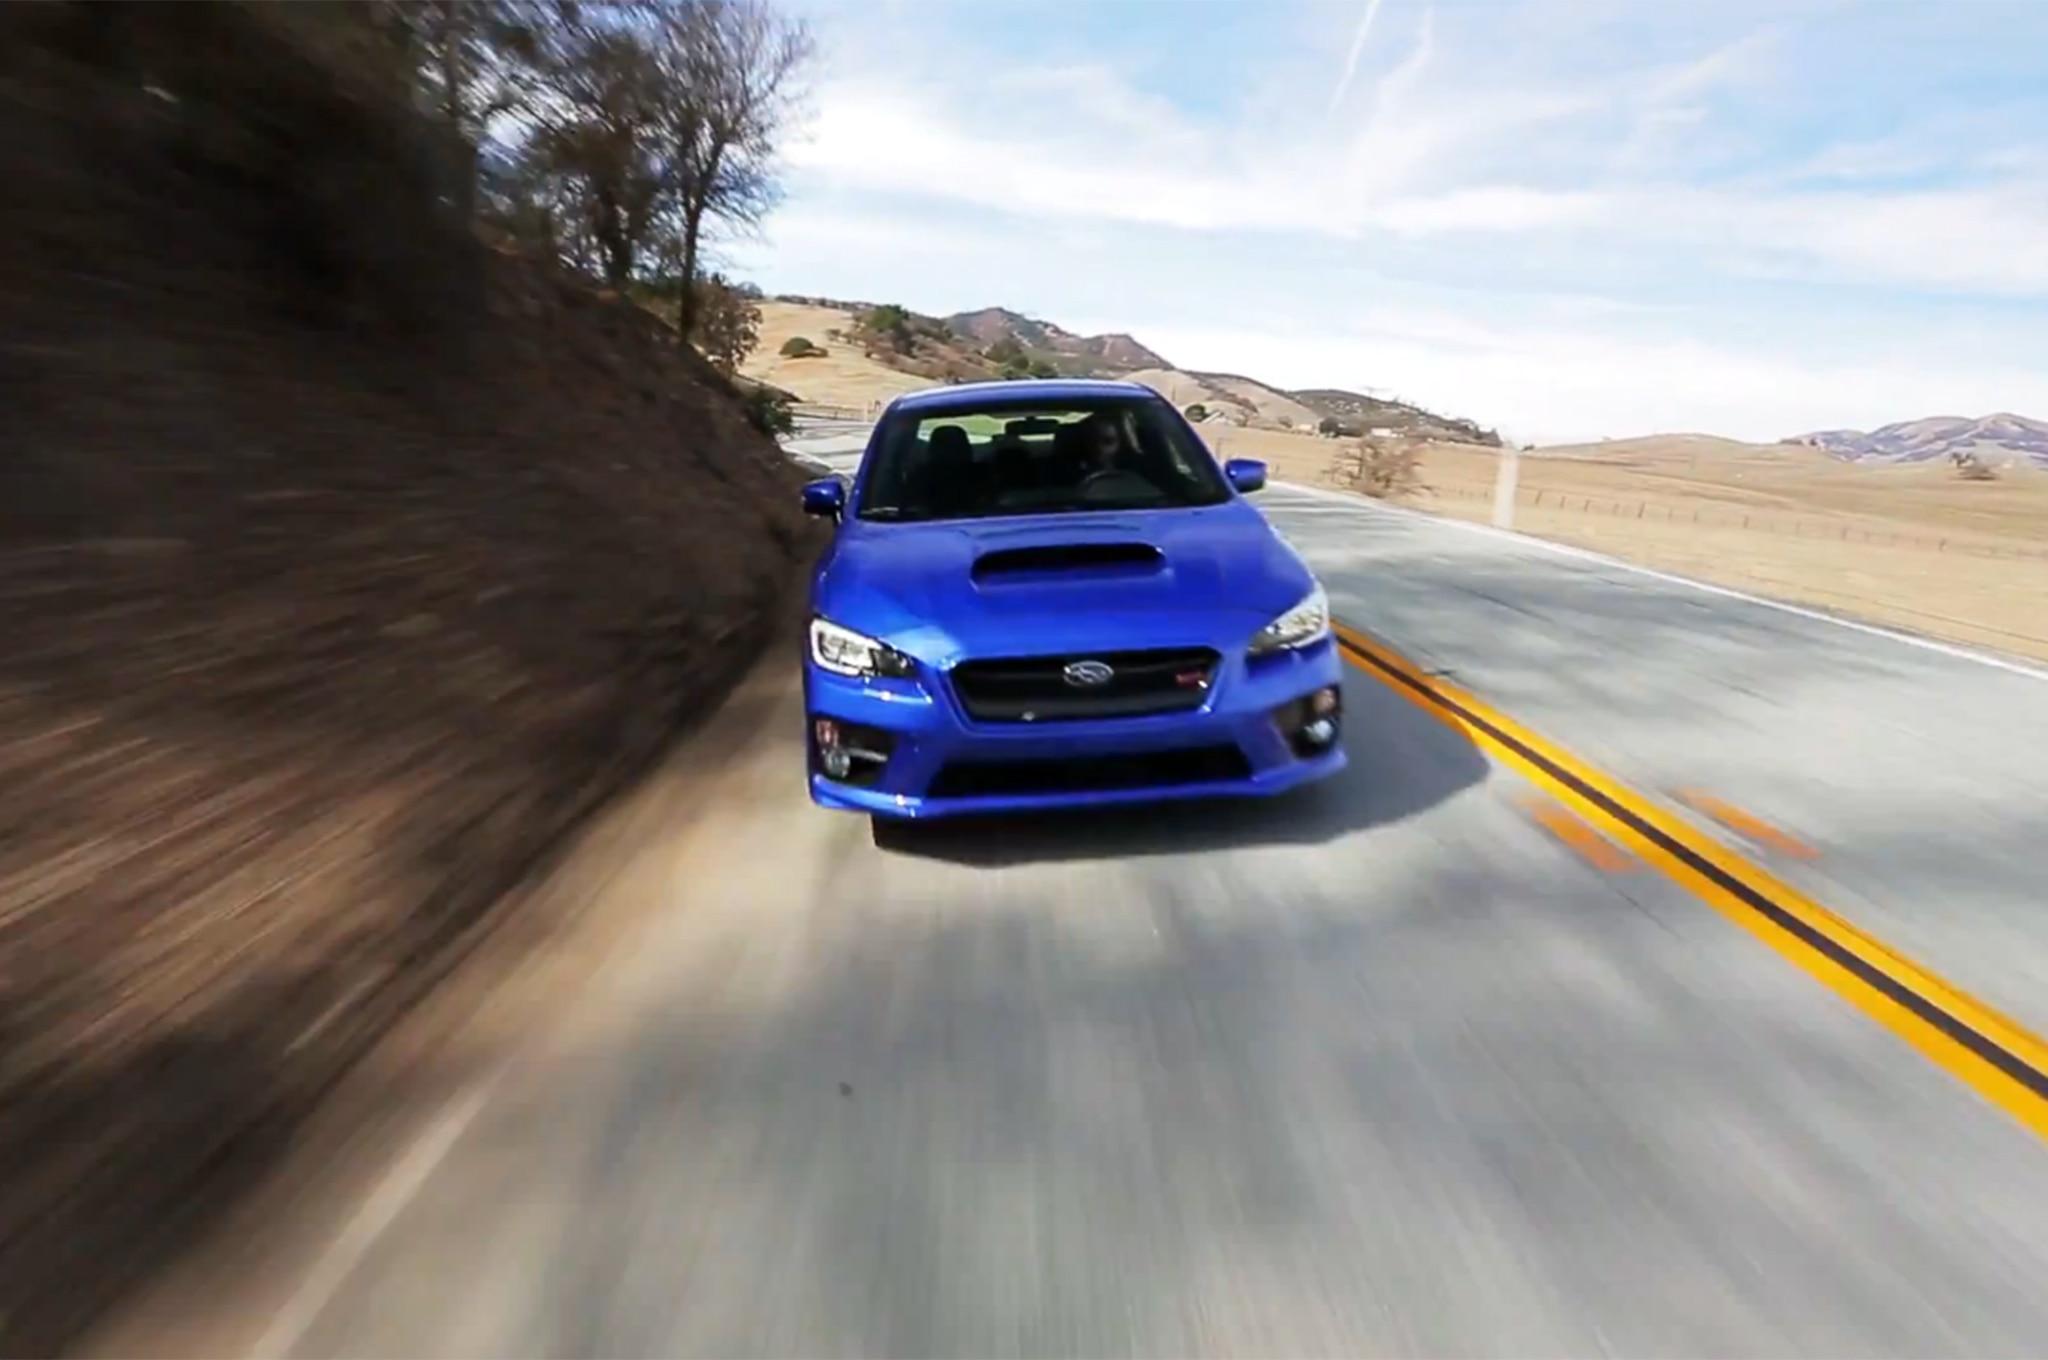 2015 Subaru Wrx Sti Front Video